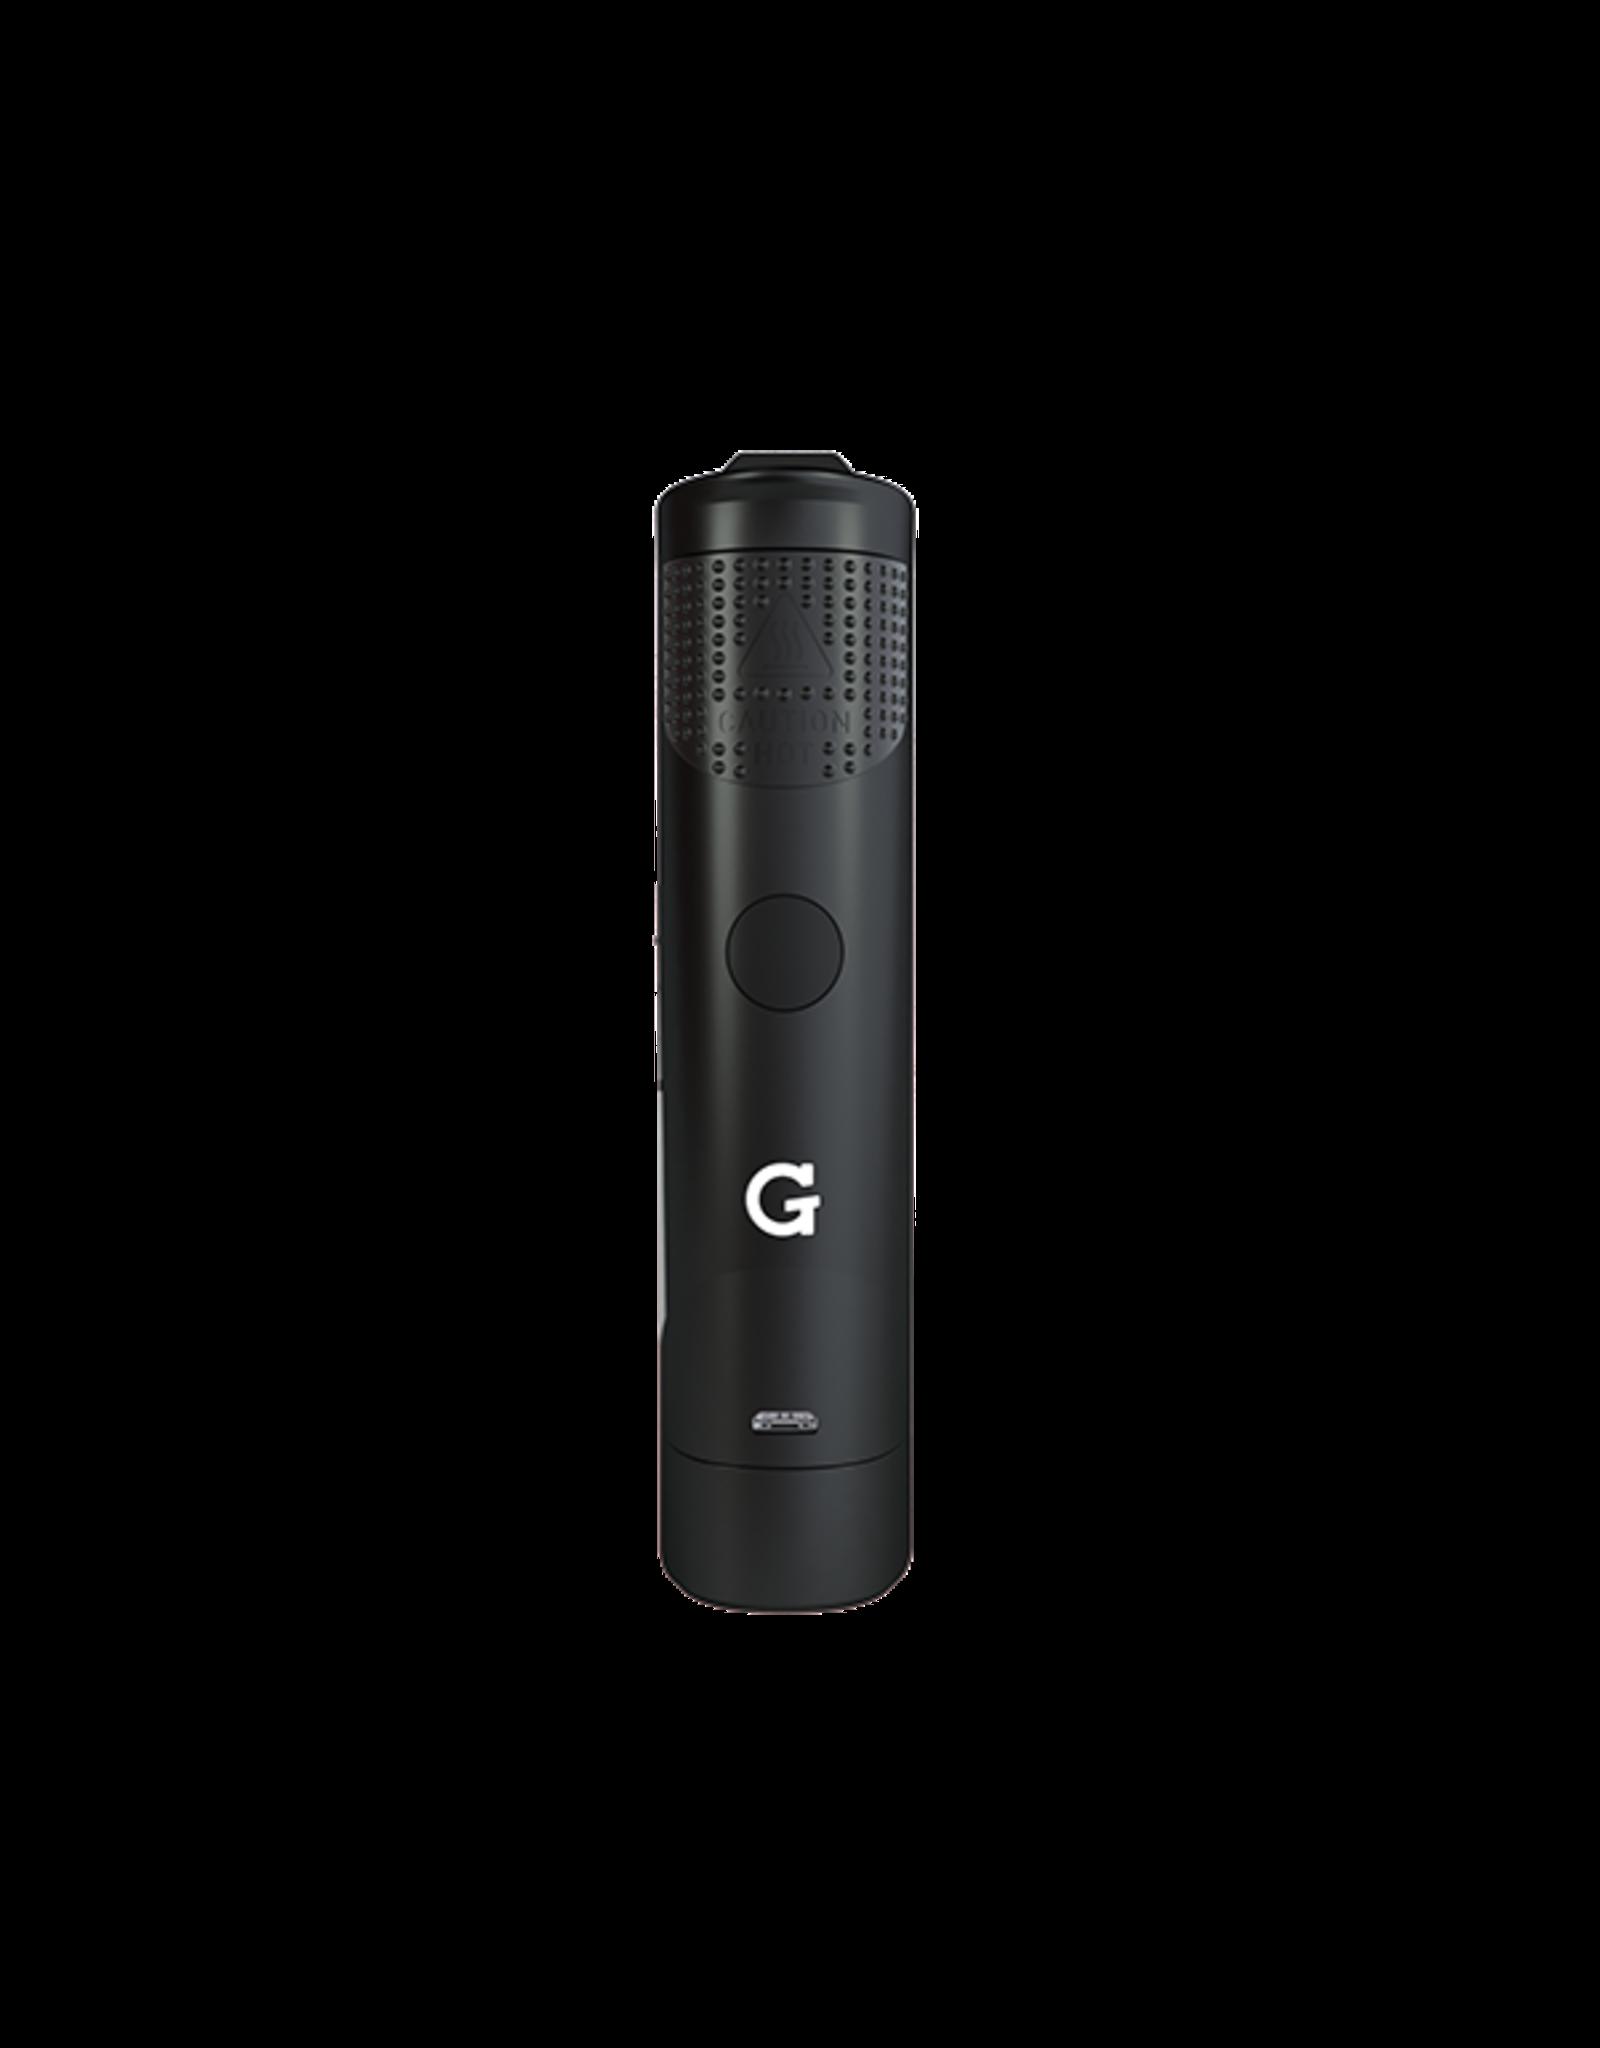 GPEN G pen Roam Vaporizer